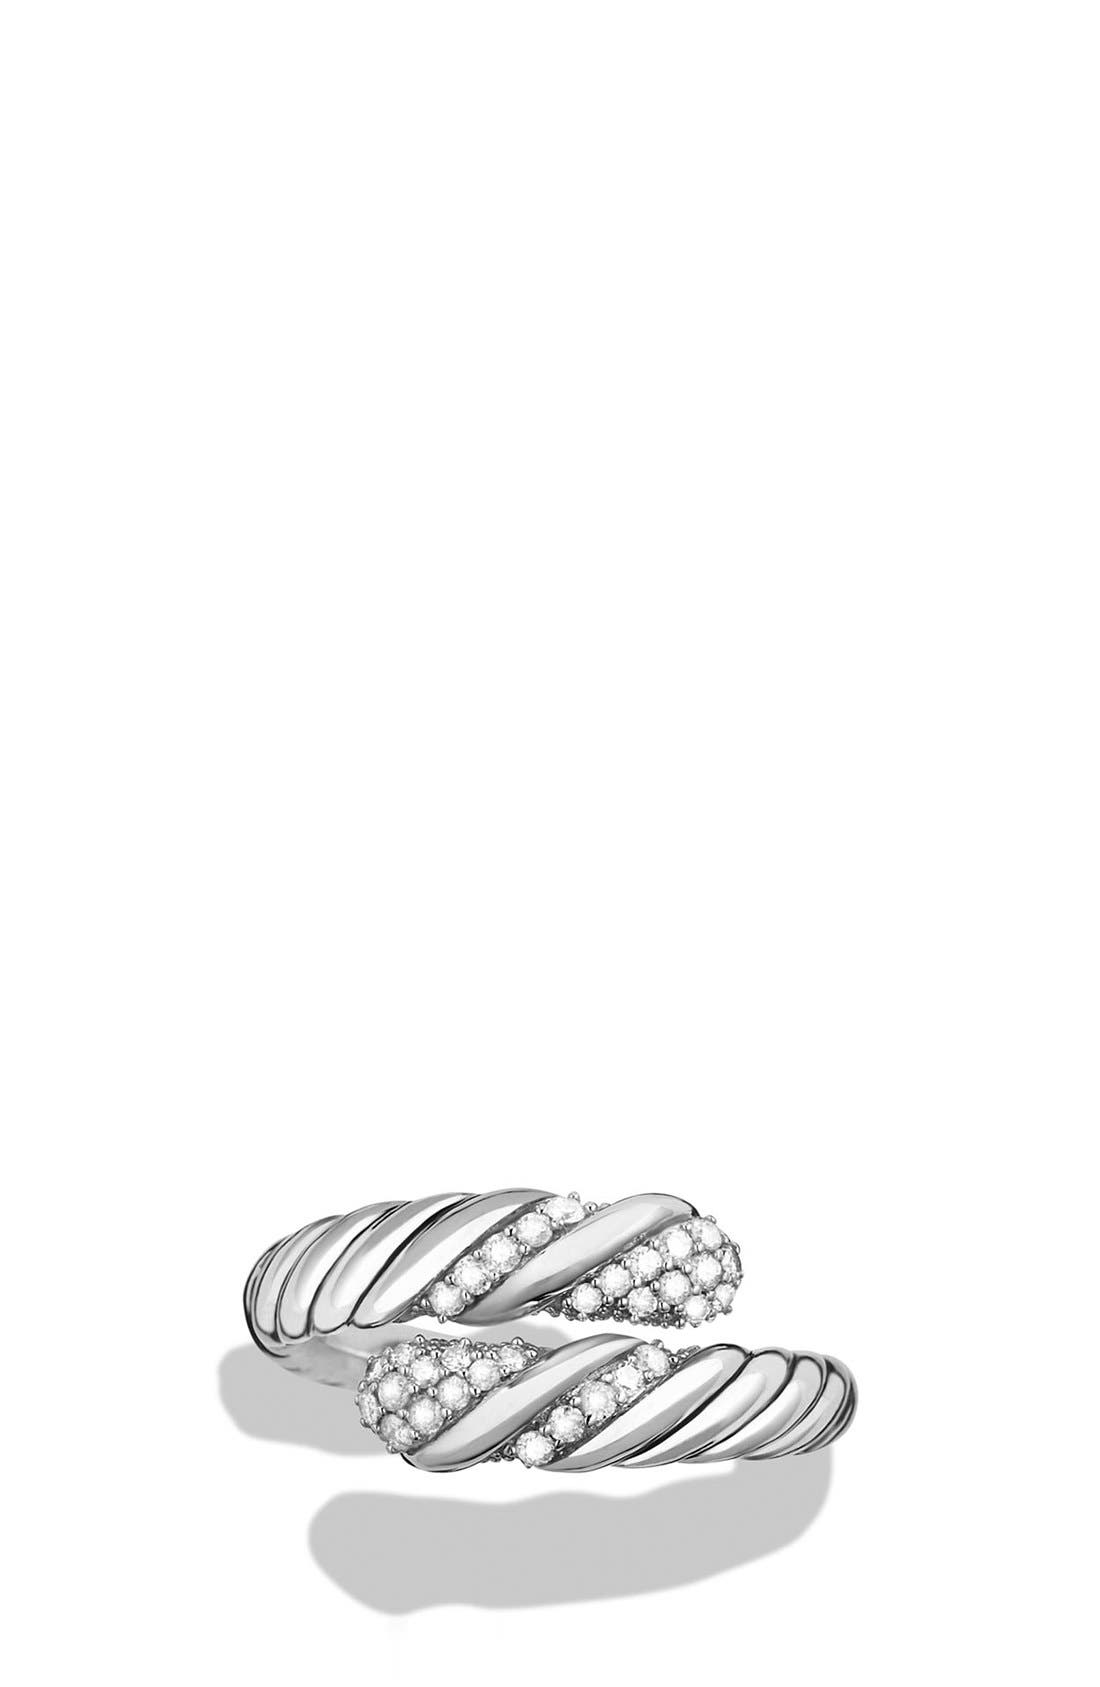 Alternate Image 3  - David Yurman 'Willow' Open Single Row Ring with Diamonds